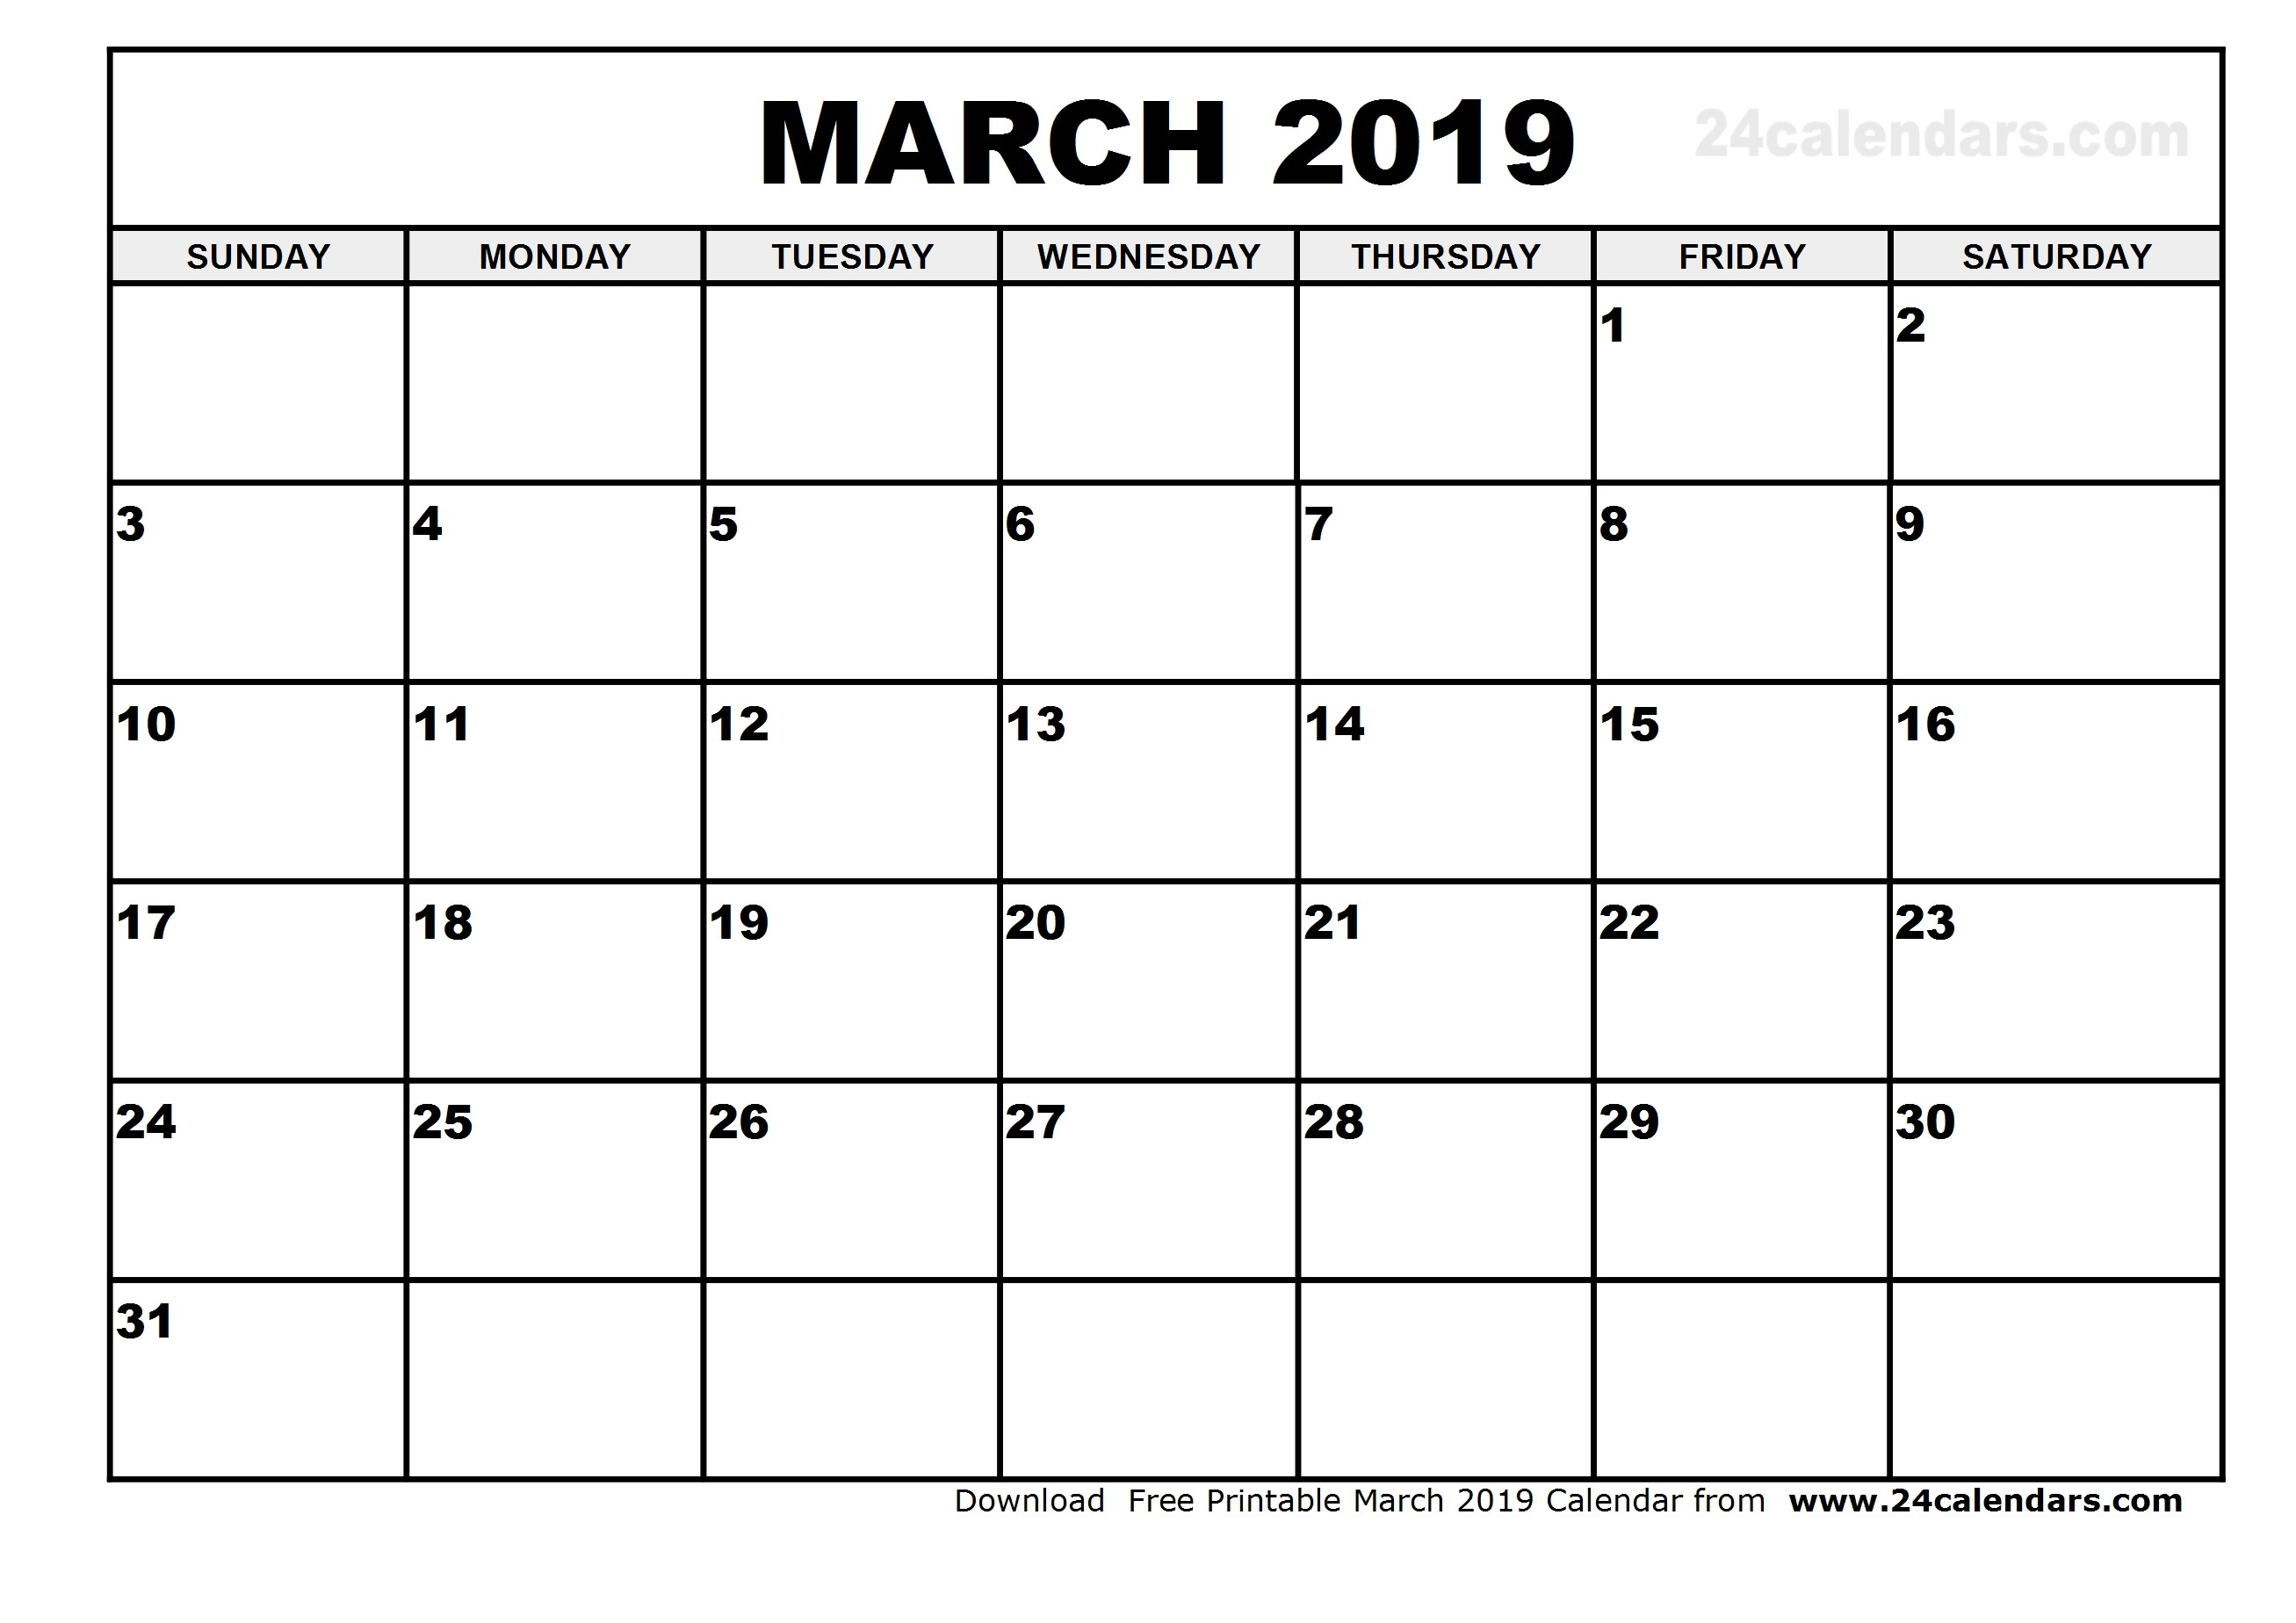 march 2019 calendar cute march 2019 printable calendar march 2019 calendar 1 teysli SOALpy